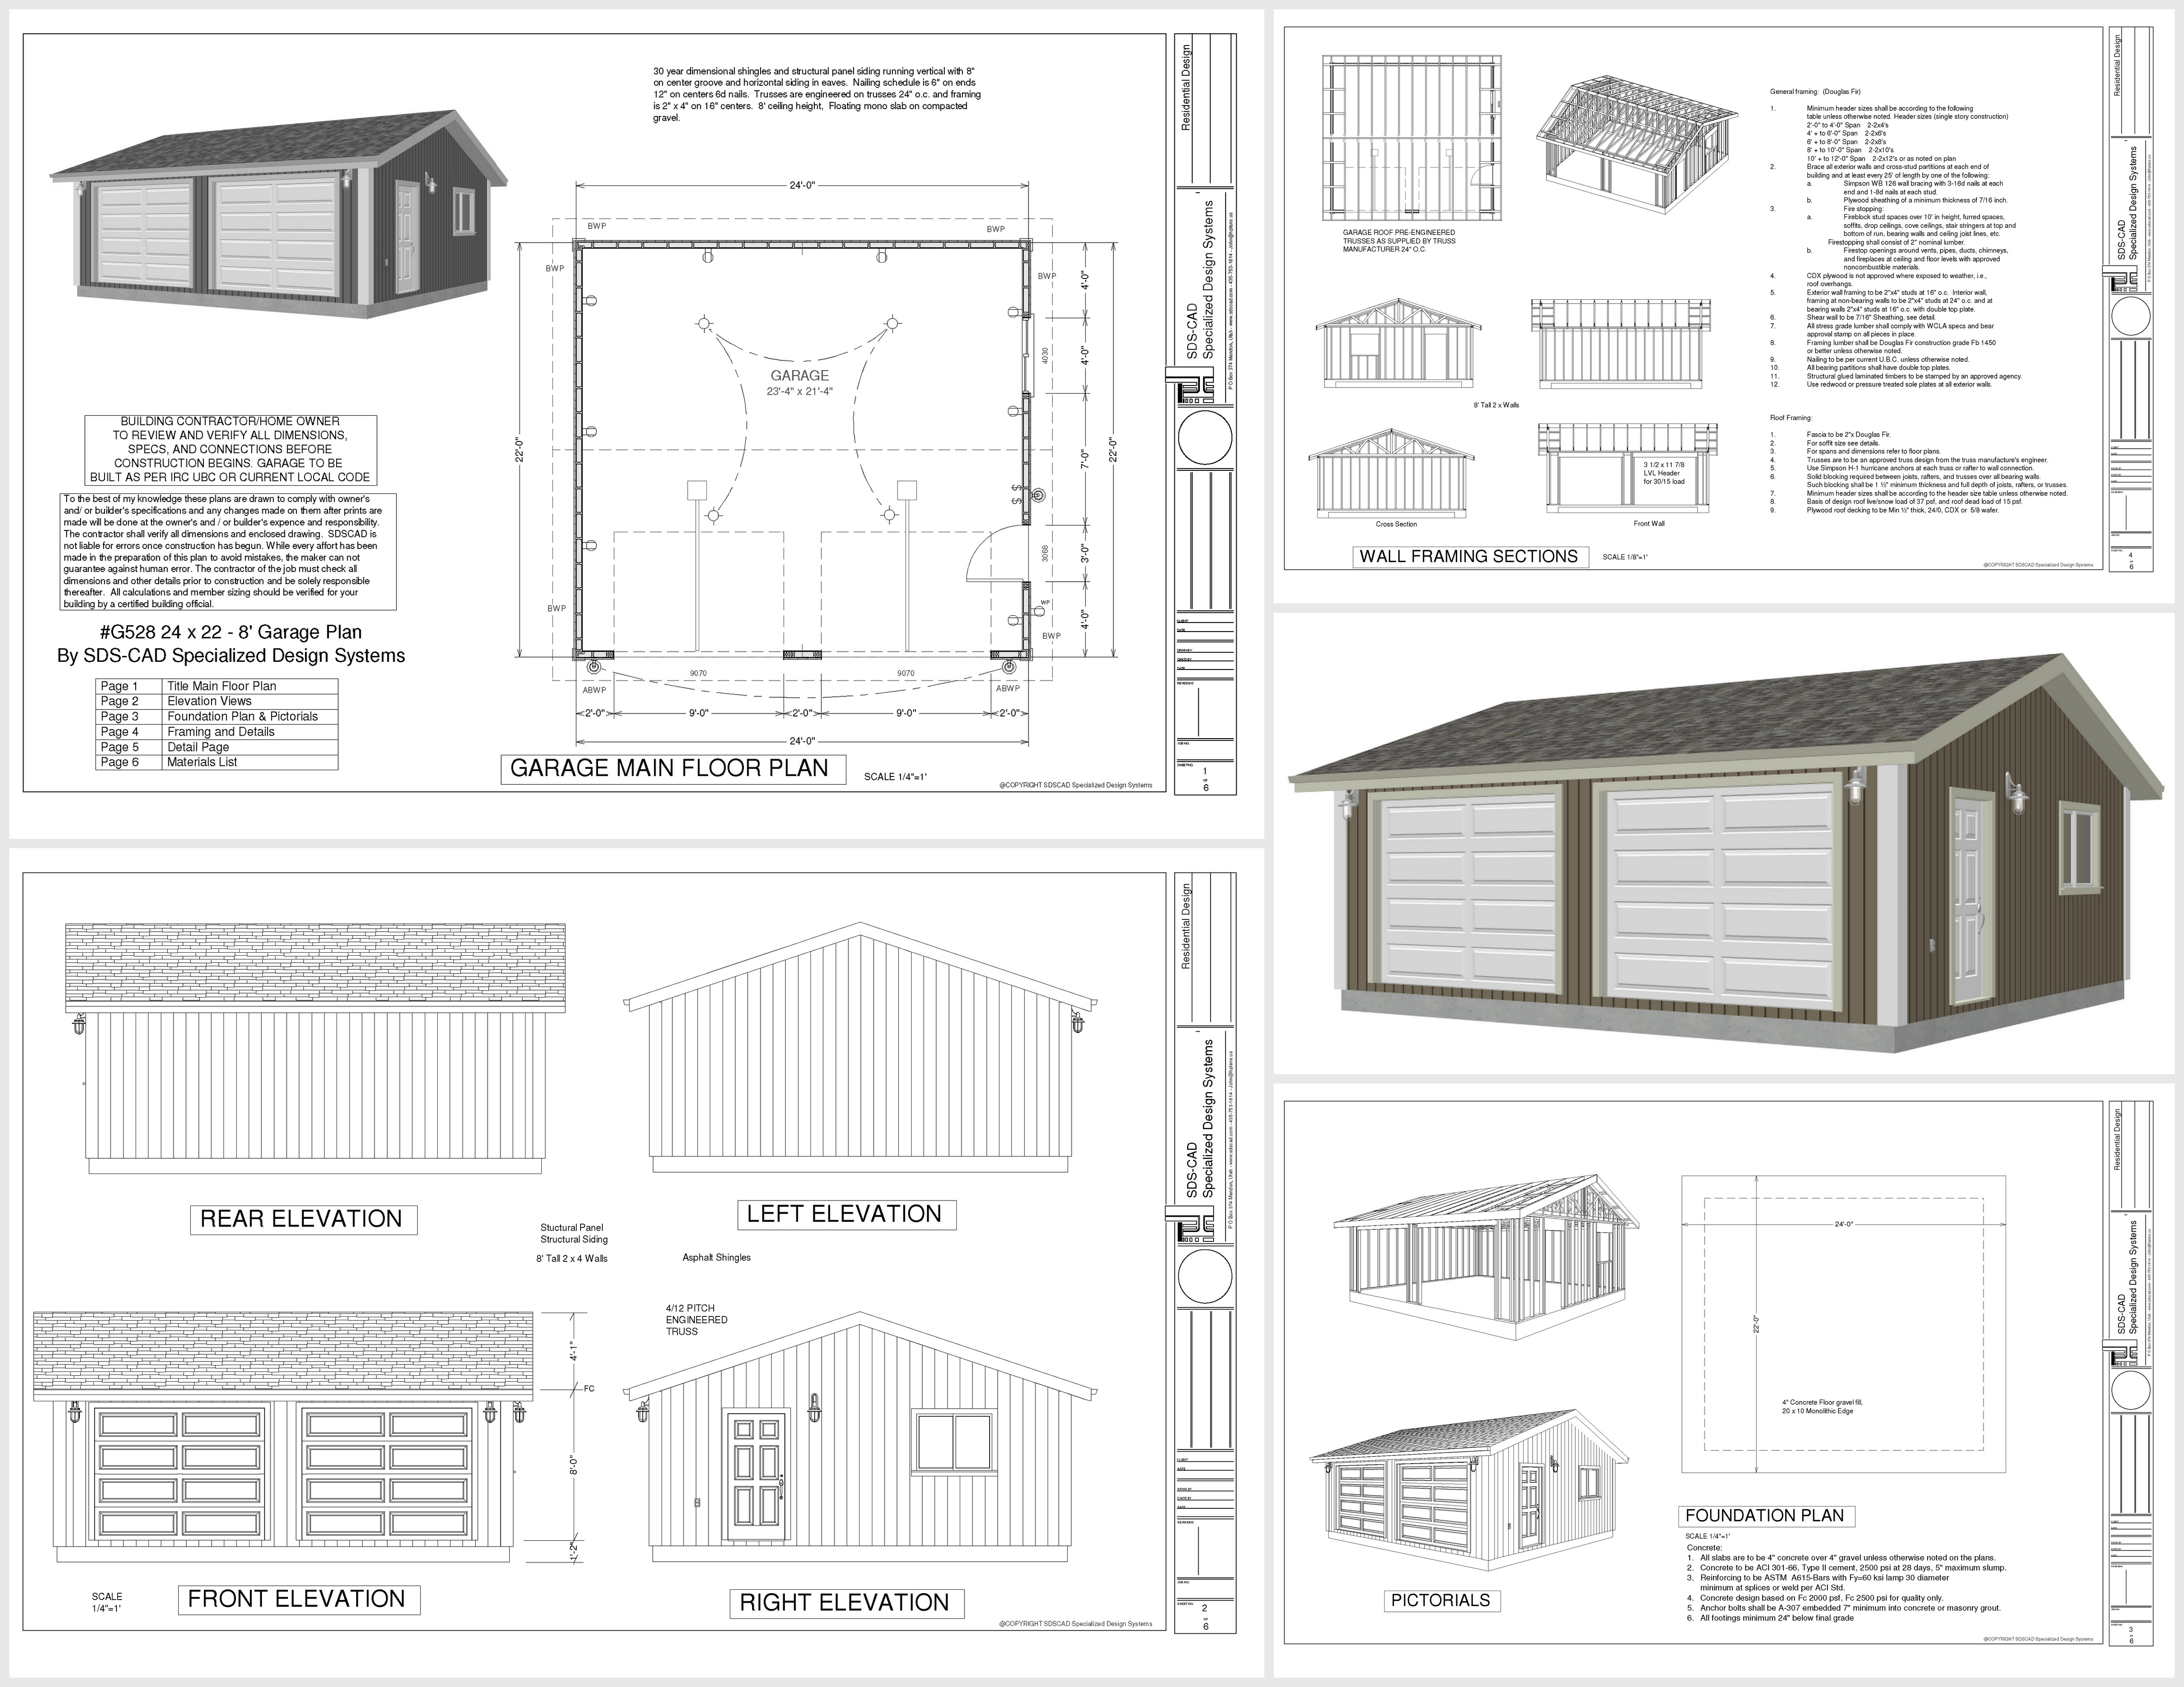 G528 24 x 22 x 8 Garage Plan PDF and DWG – 24 X 26 Garage Plans